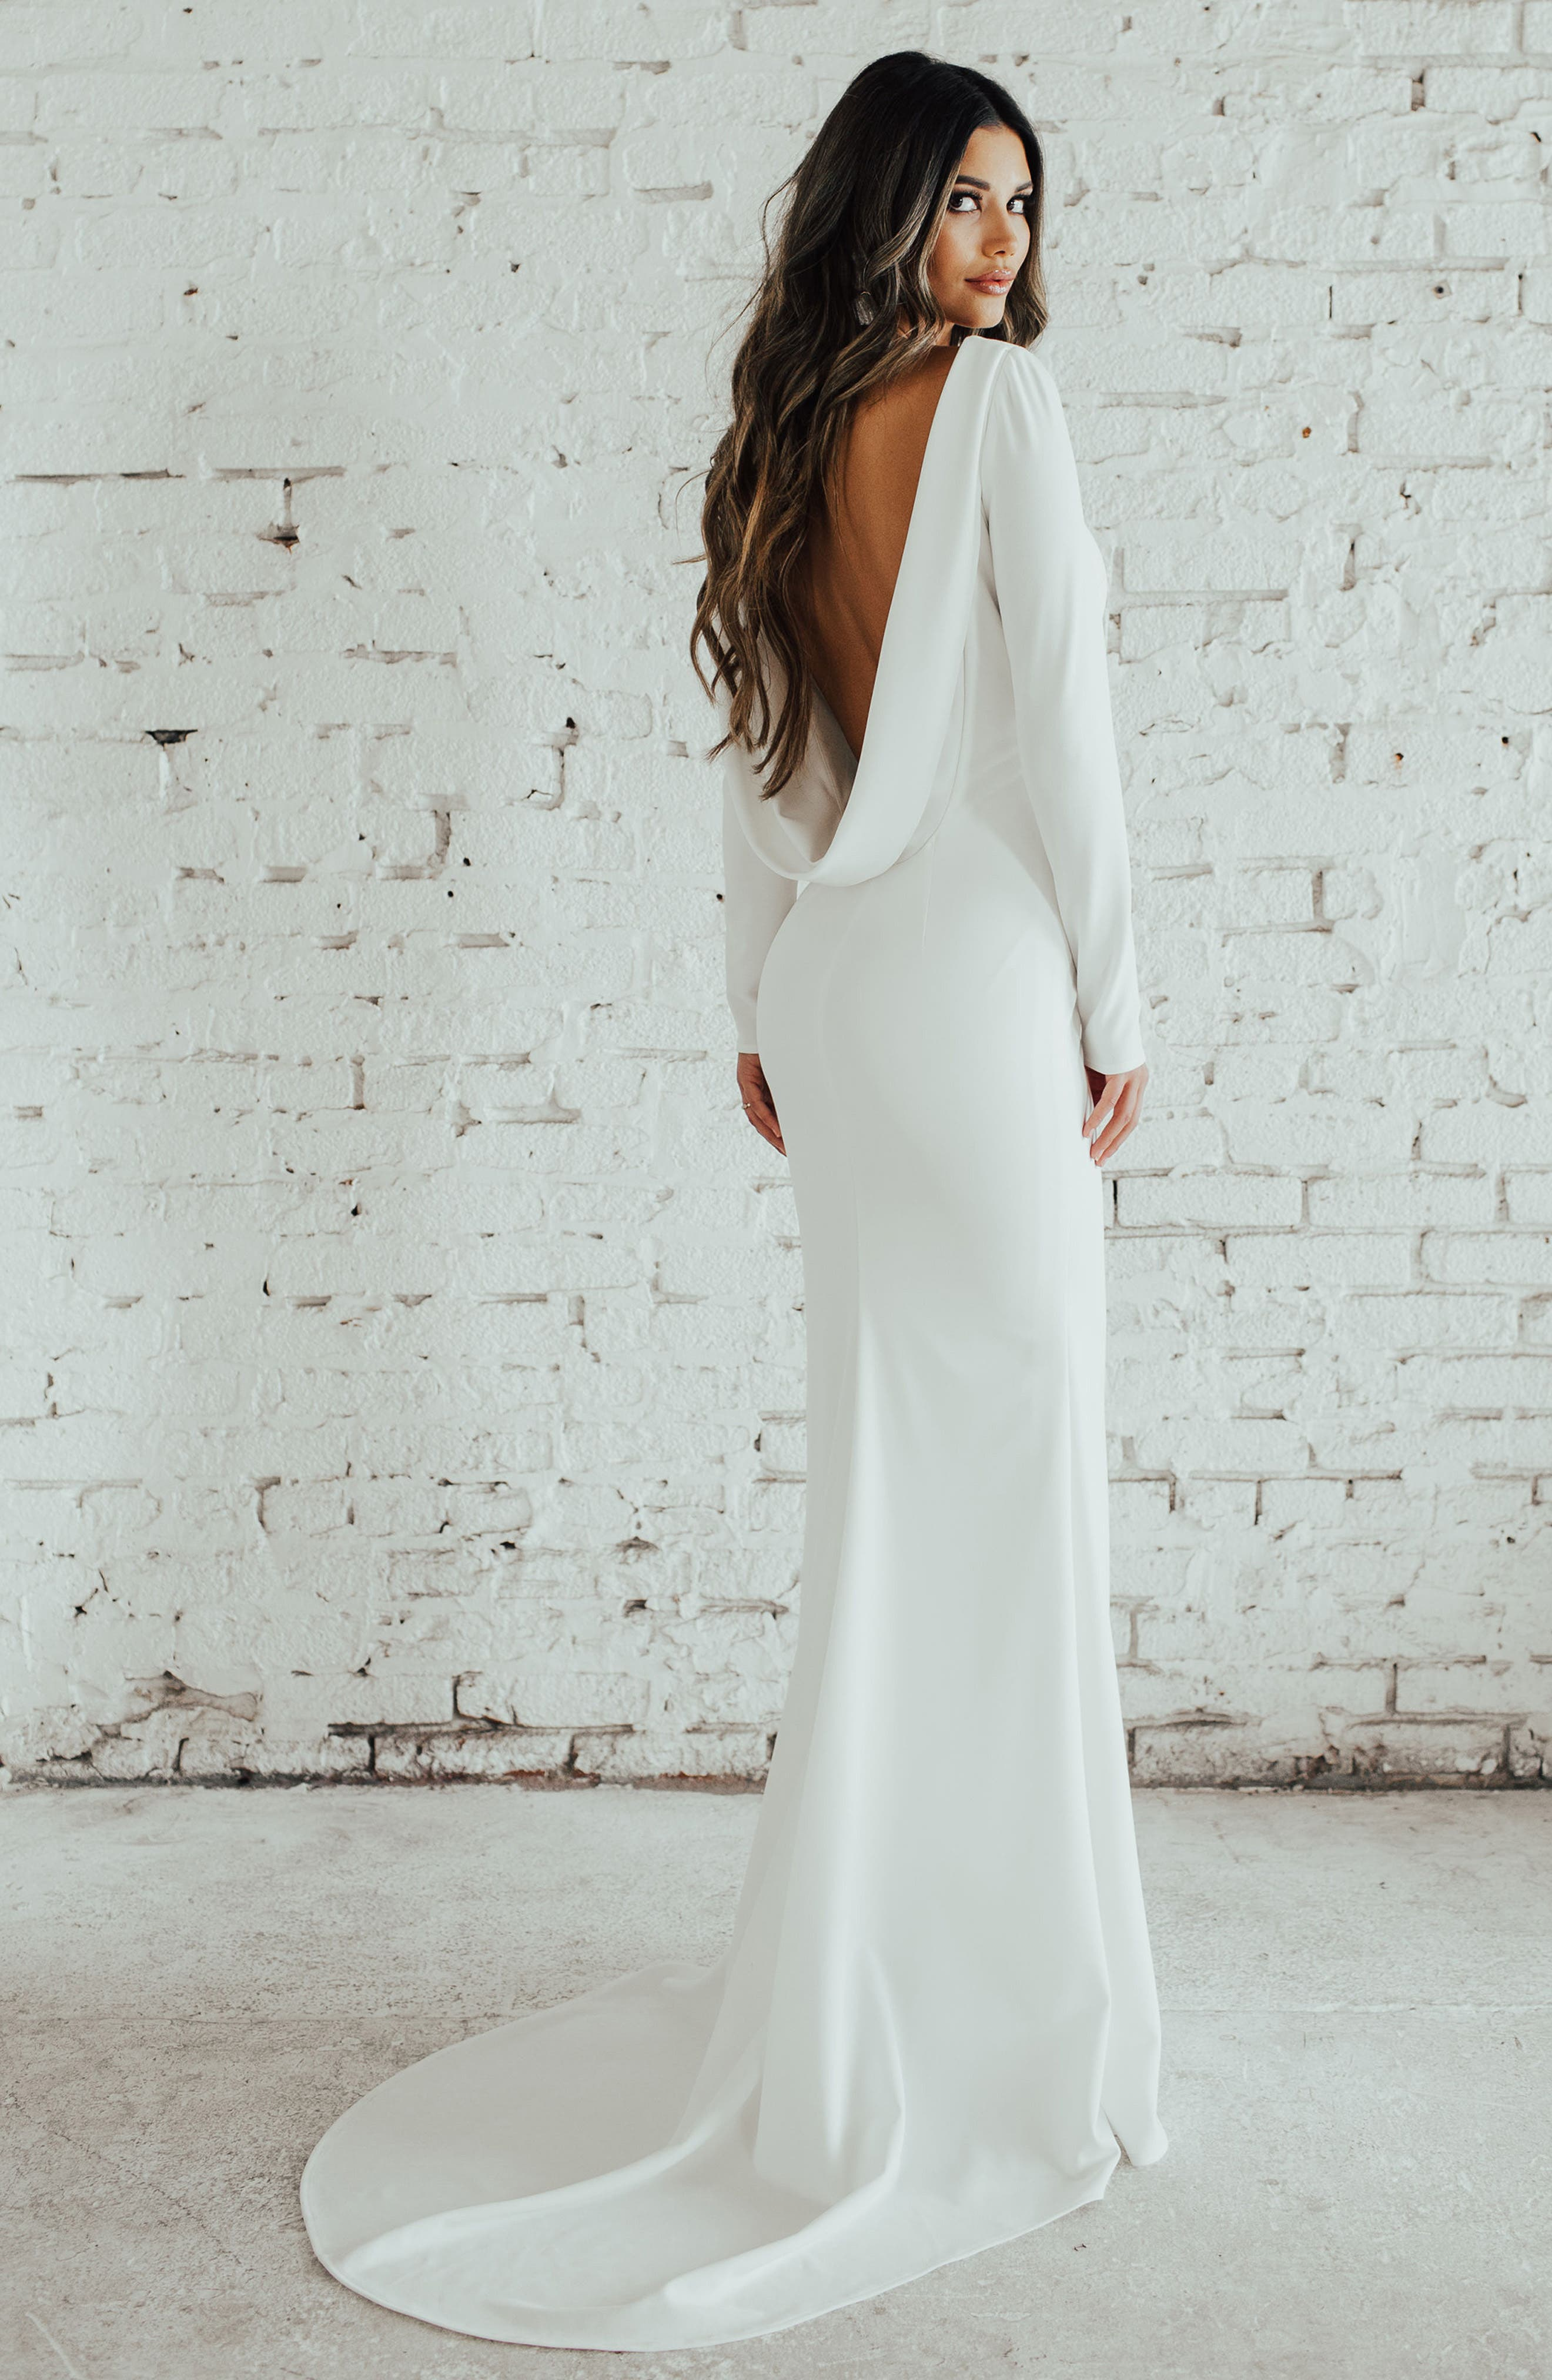 White Gown Wedding Dress